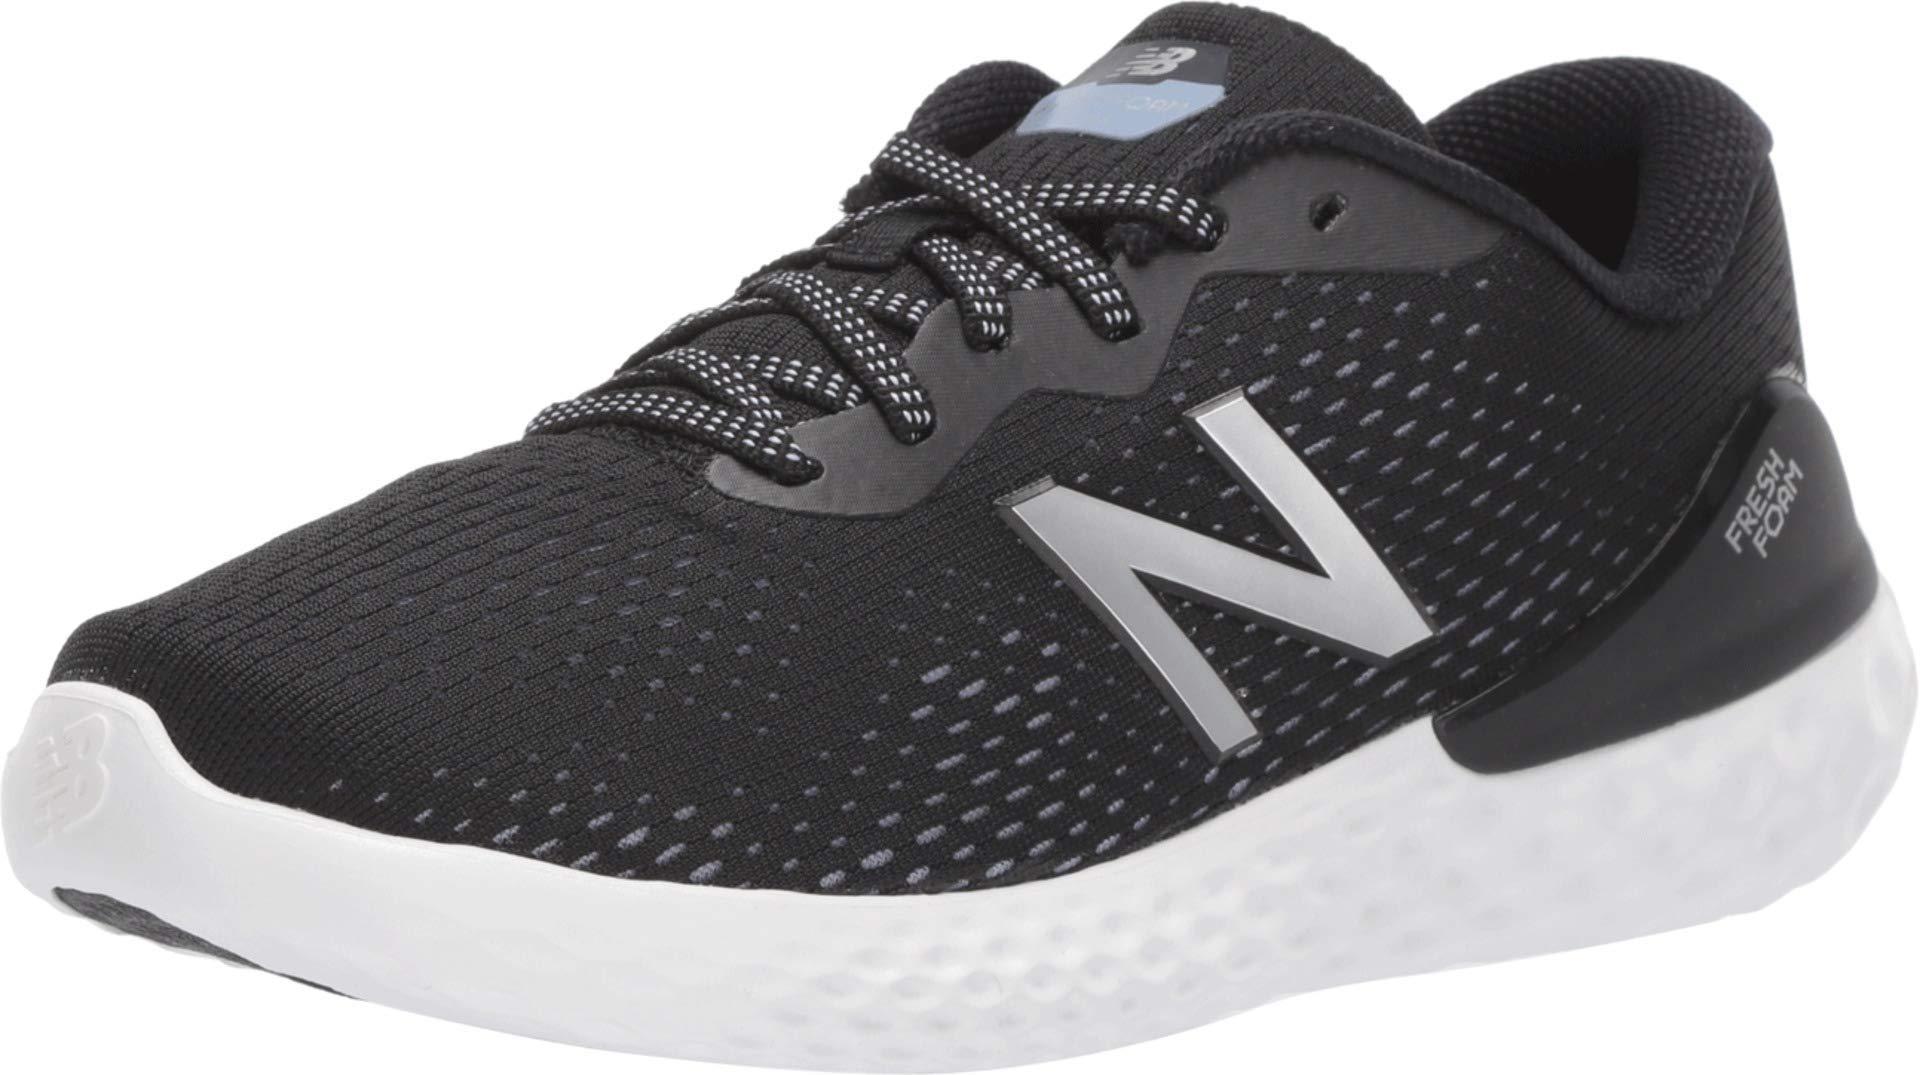 New Balance Women's Fresh Foam 1365 V1 Walking Shoe